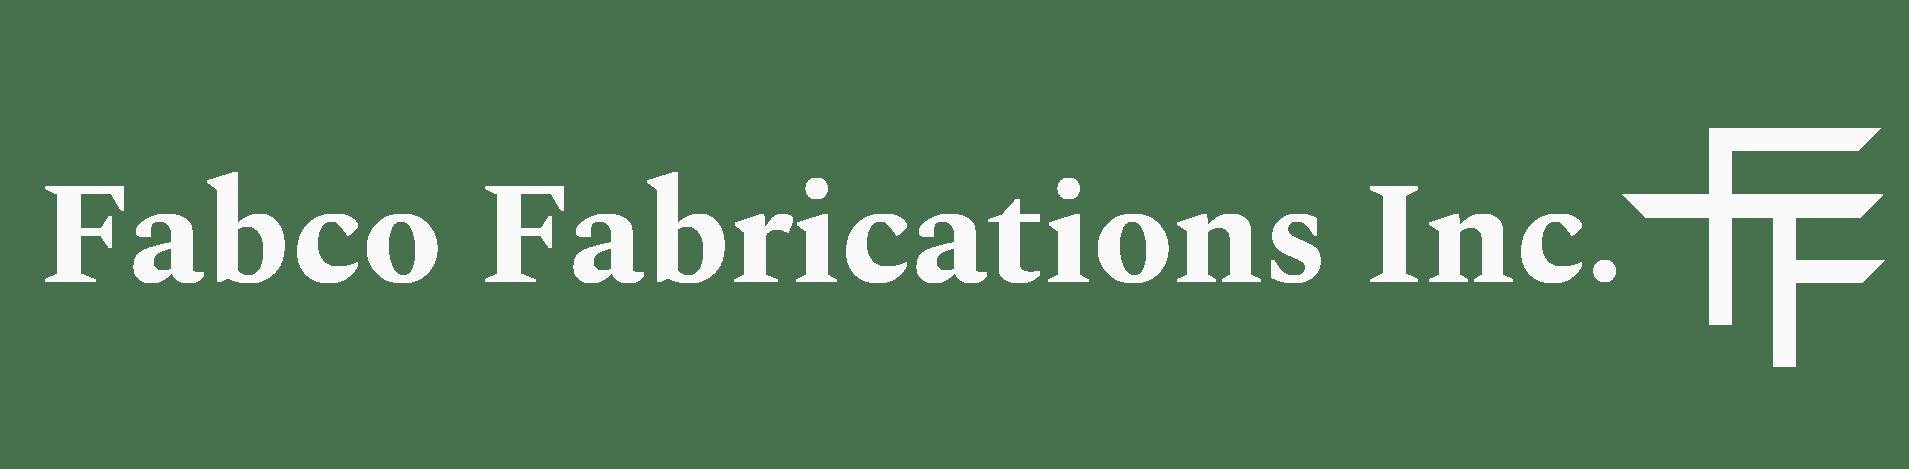 Fabco Fabrications Inc